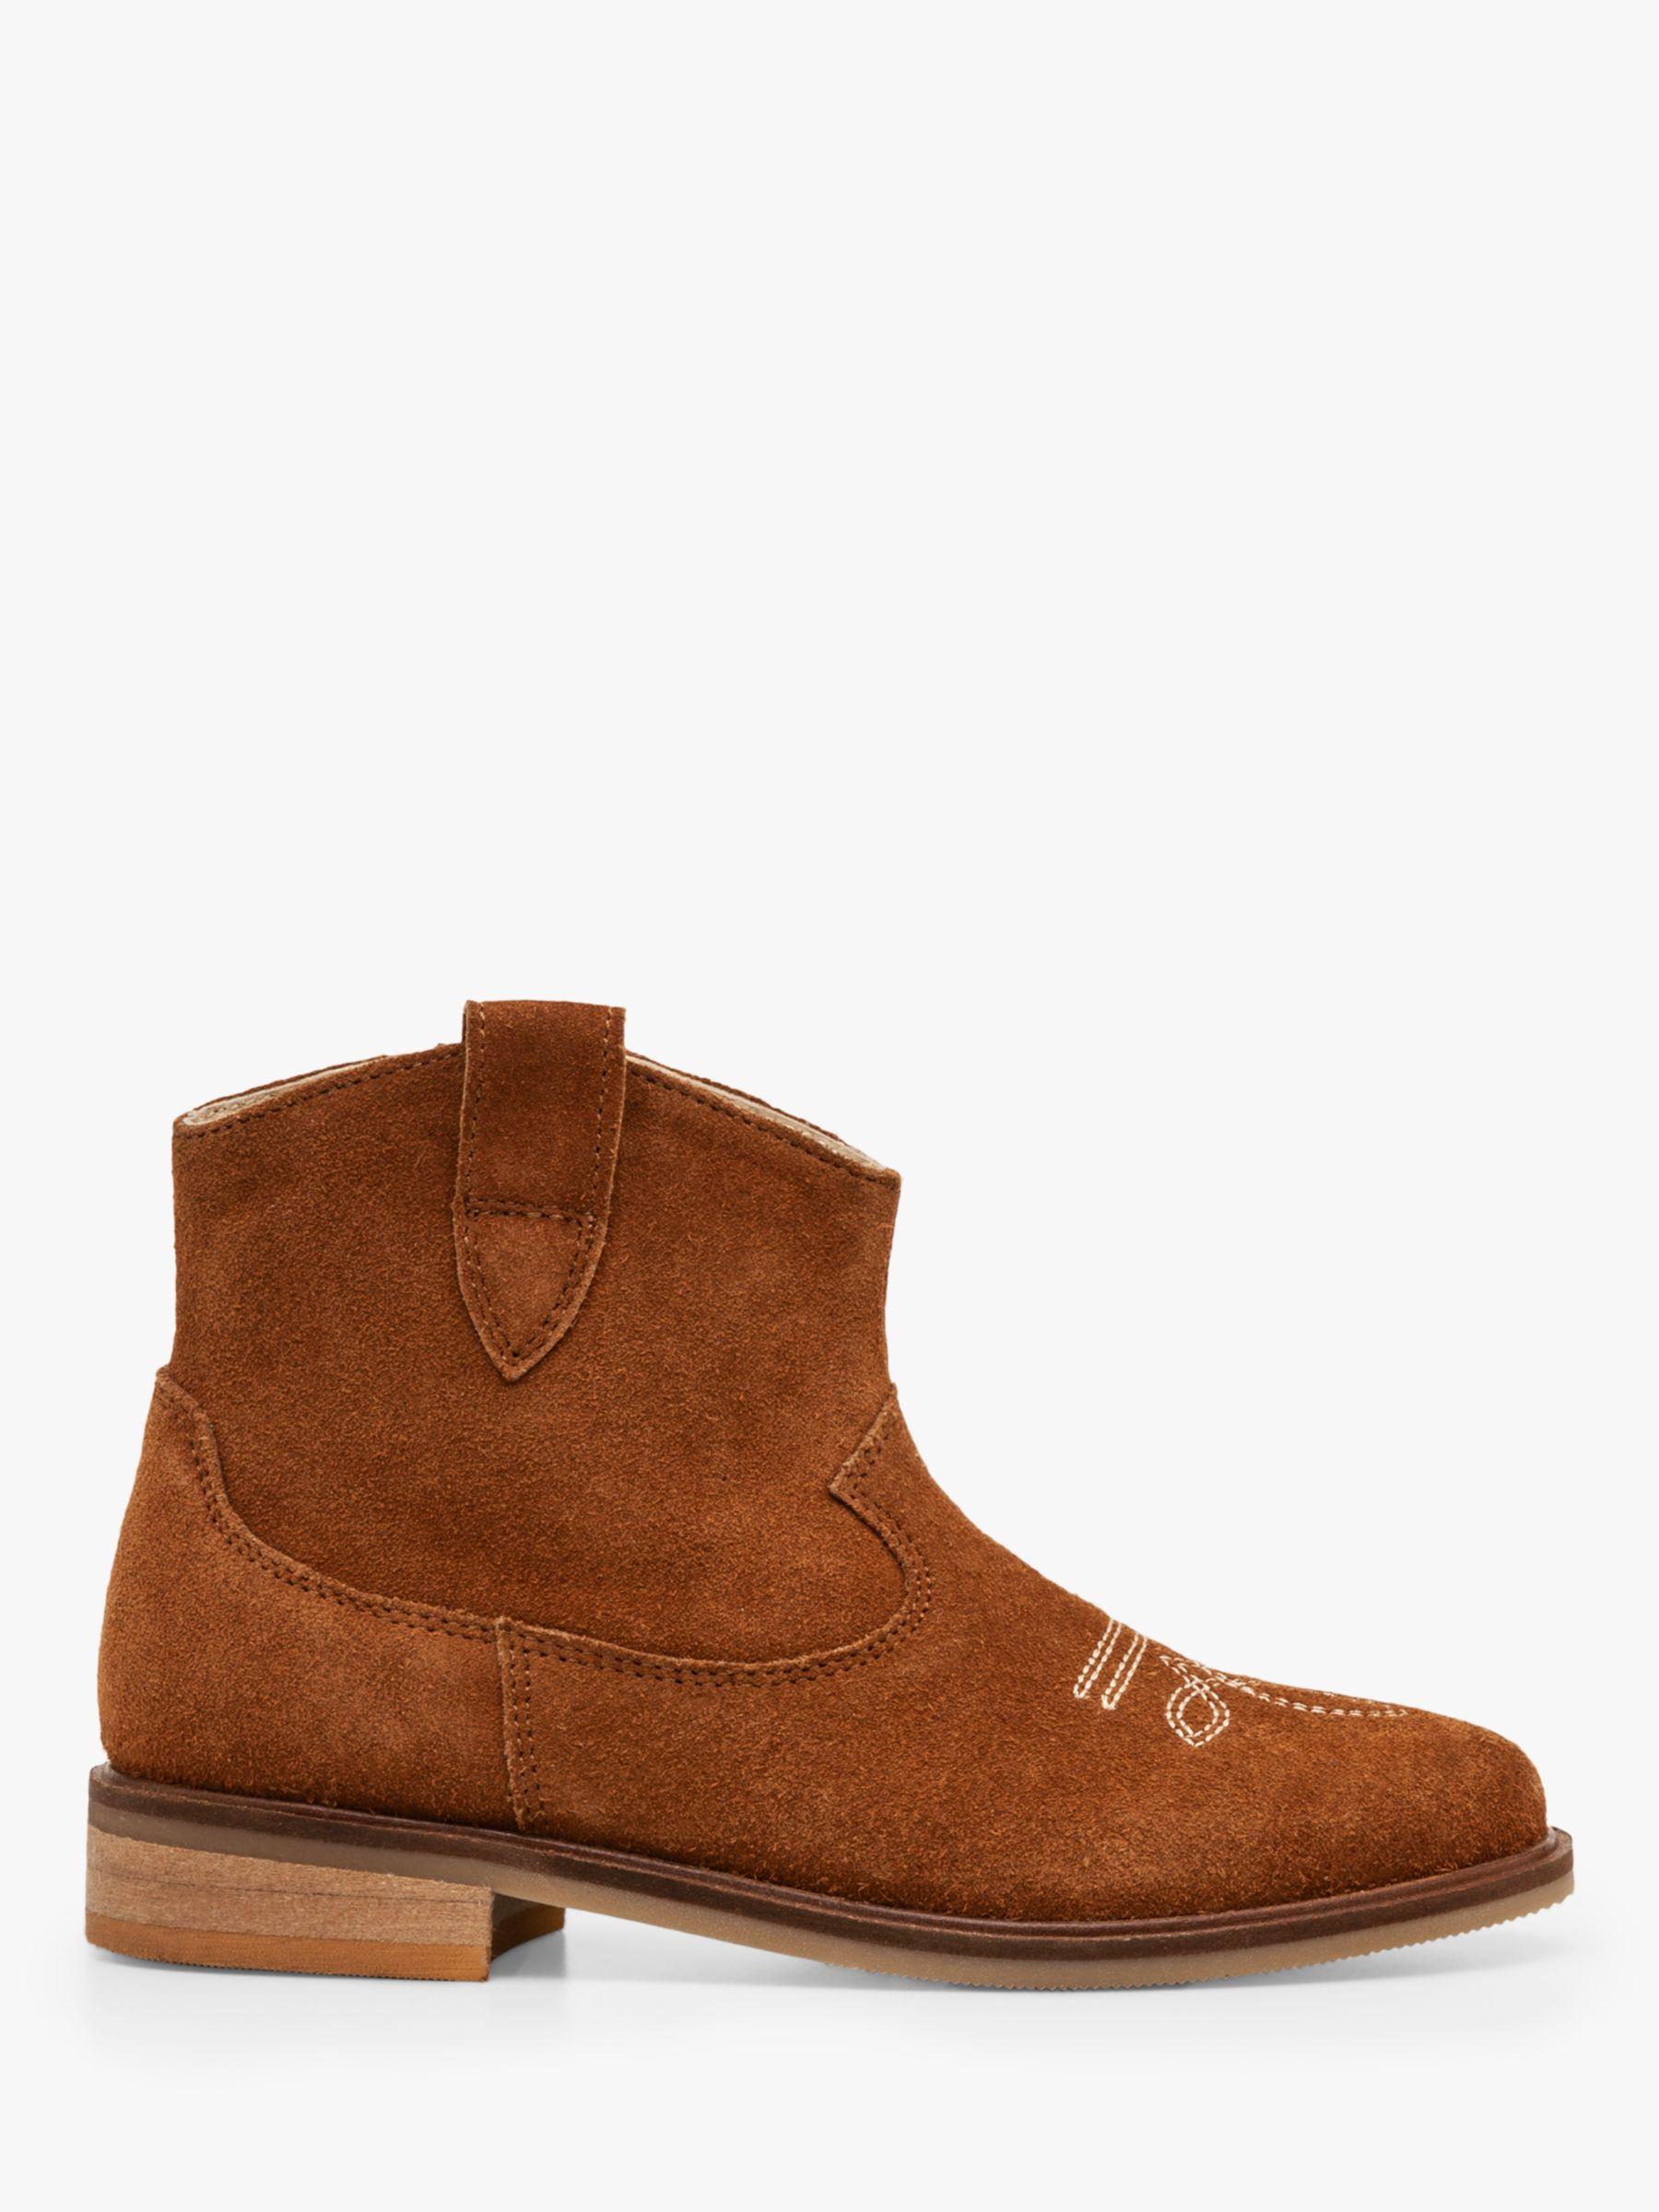 Mini Boden Mini Boden Suede Western Boots, Tan